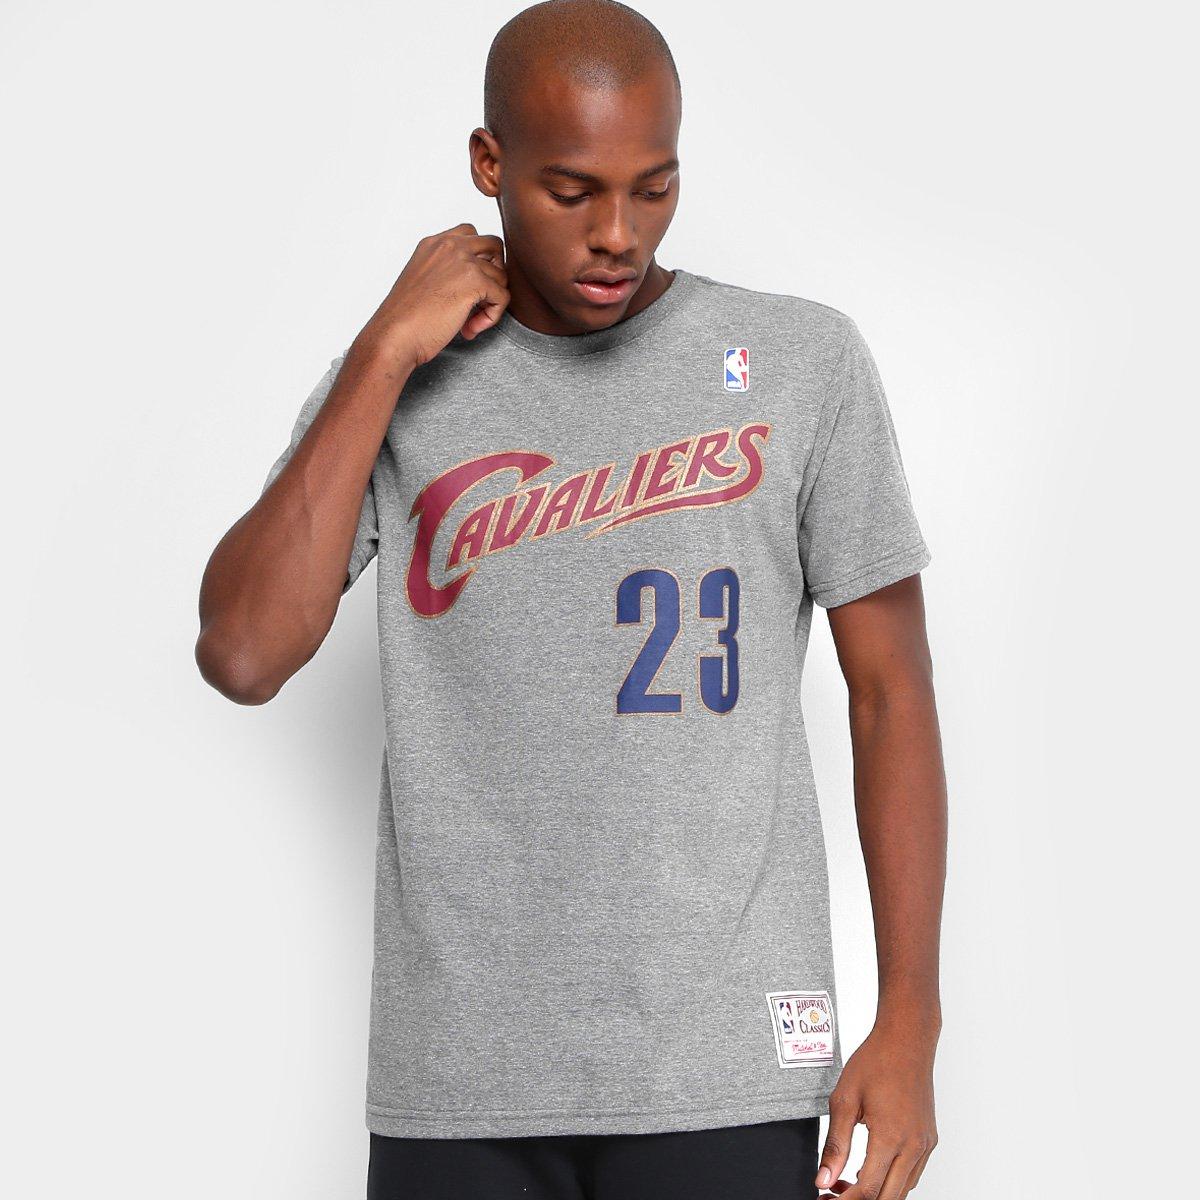 e76beb1f6 Camiseta NBA Mitchell   Ness Lebron James Masculina - Compre Agora ...